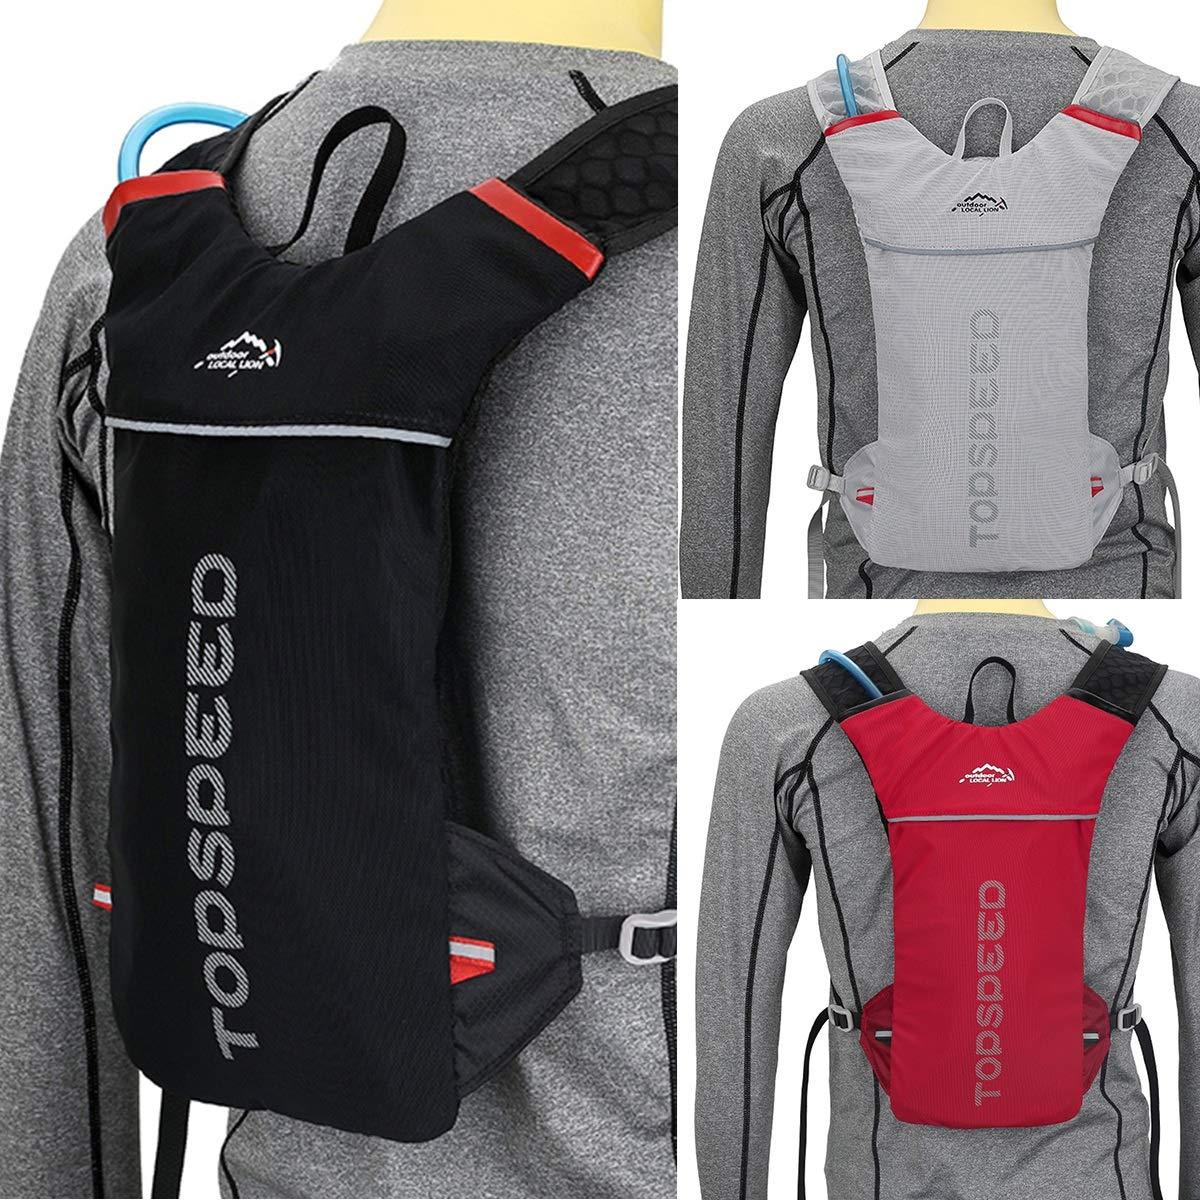 Nosii 5L Outdoor Hydration Zaino Donna Uomo Jogging Sport Zaino da Trail Running Marathon Bag Color : Red